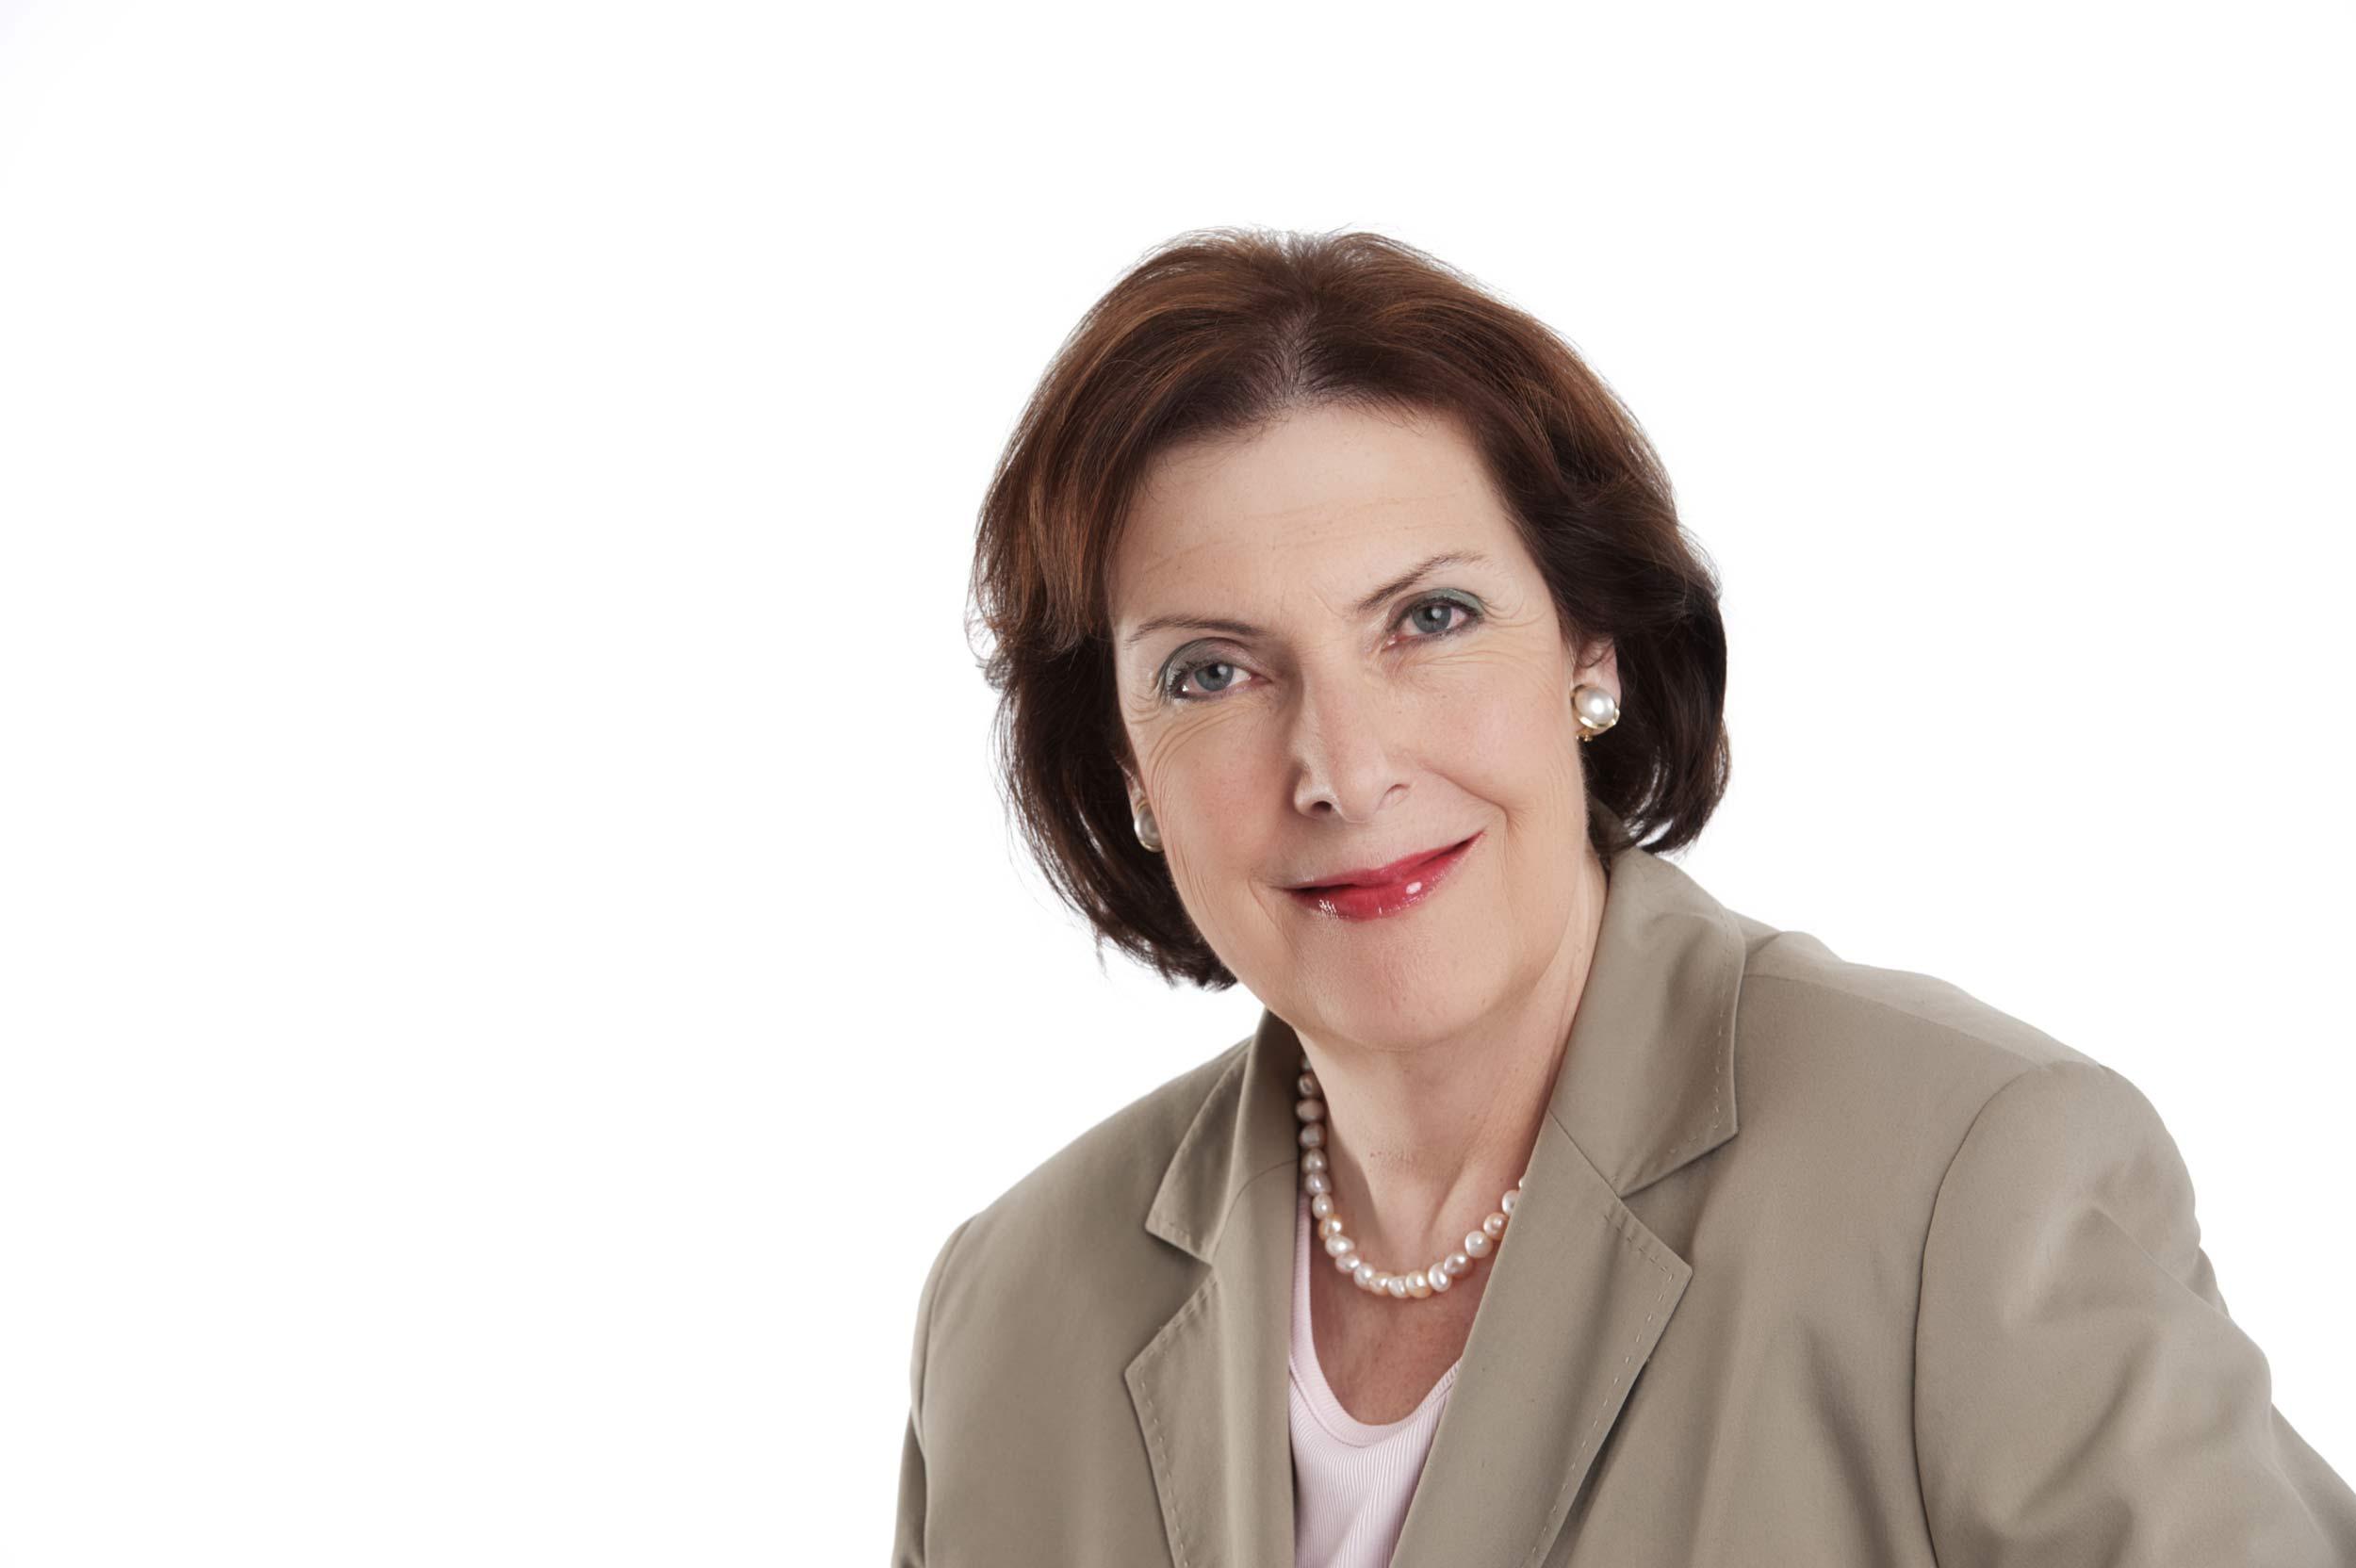 Christine Egerszegi